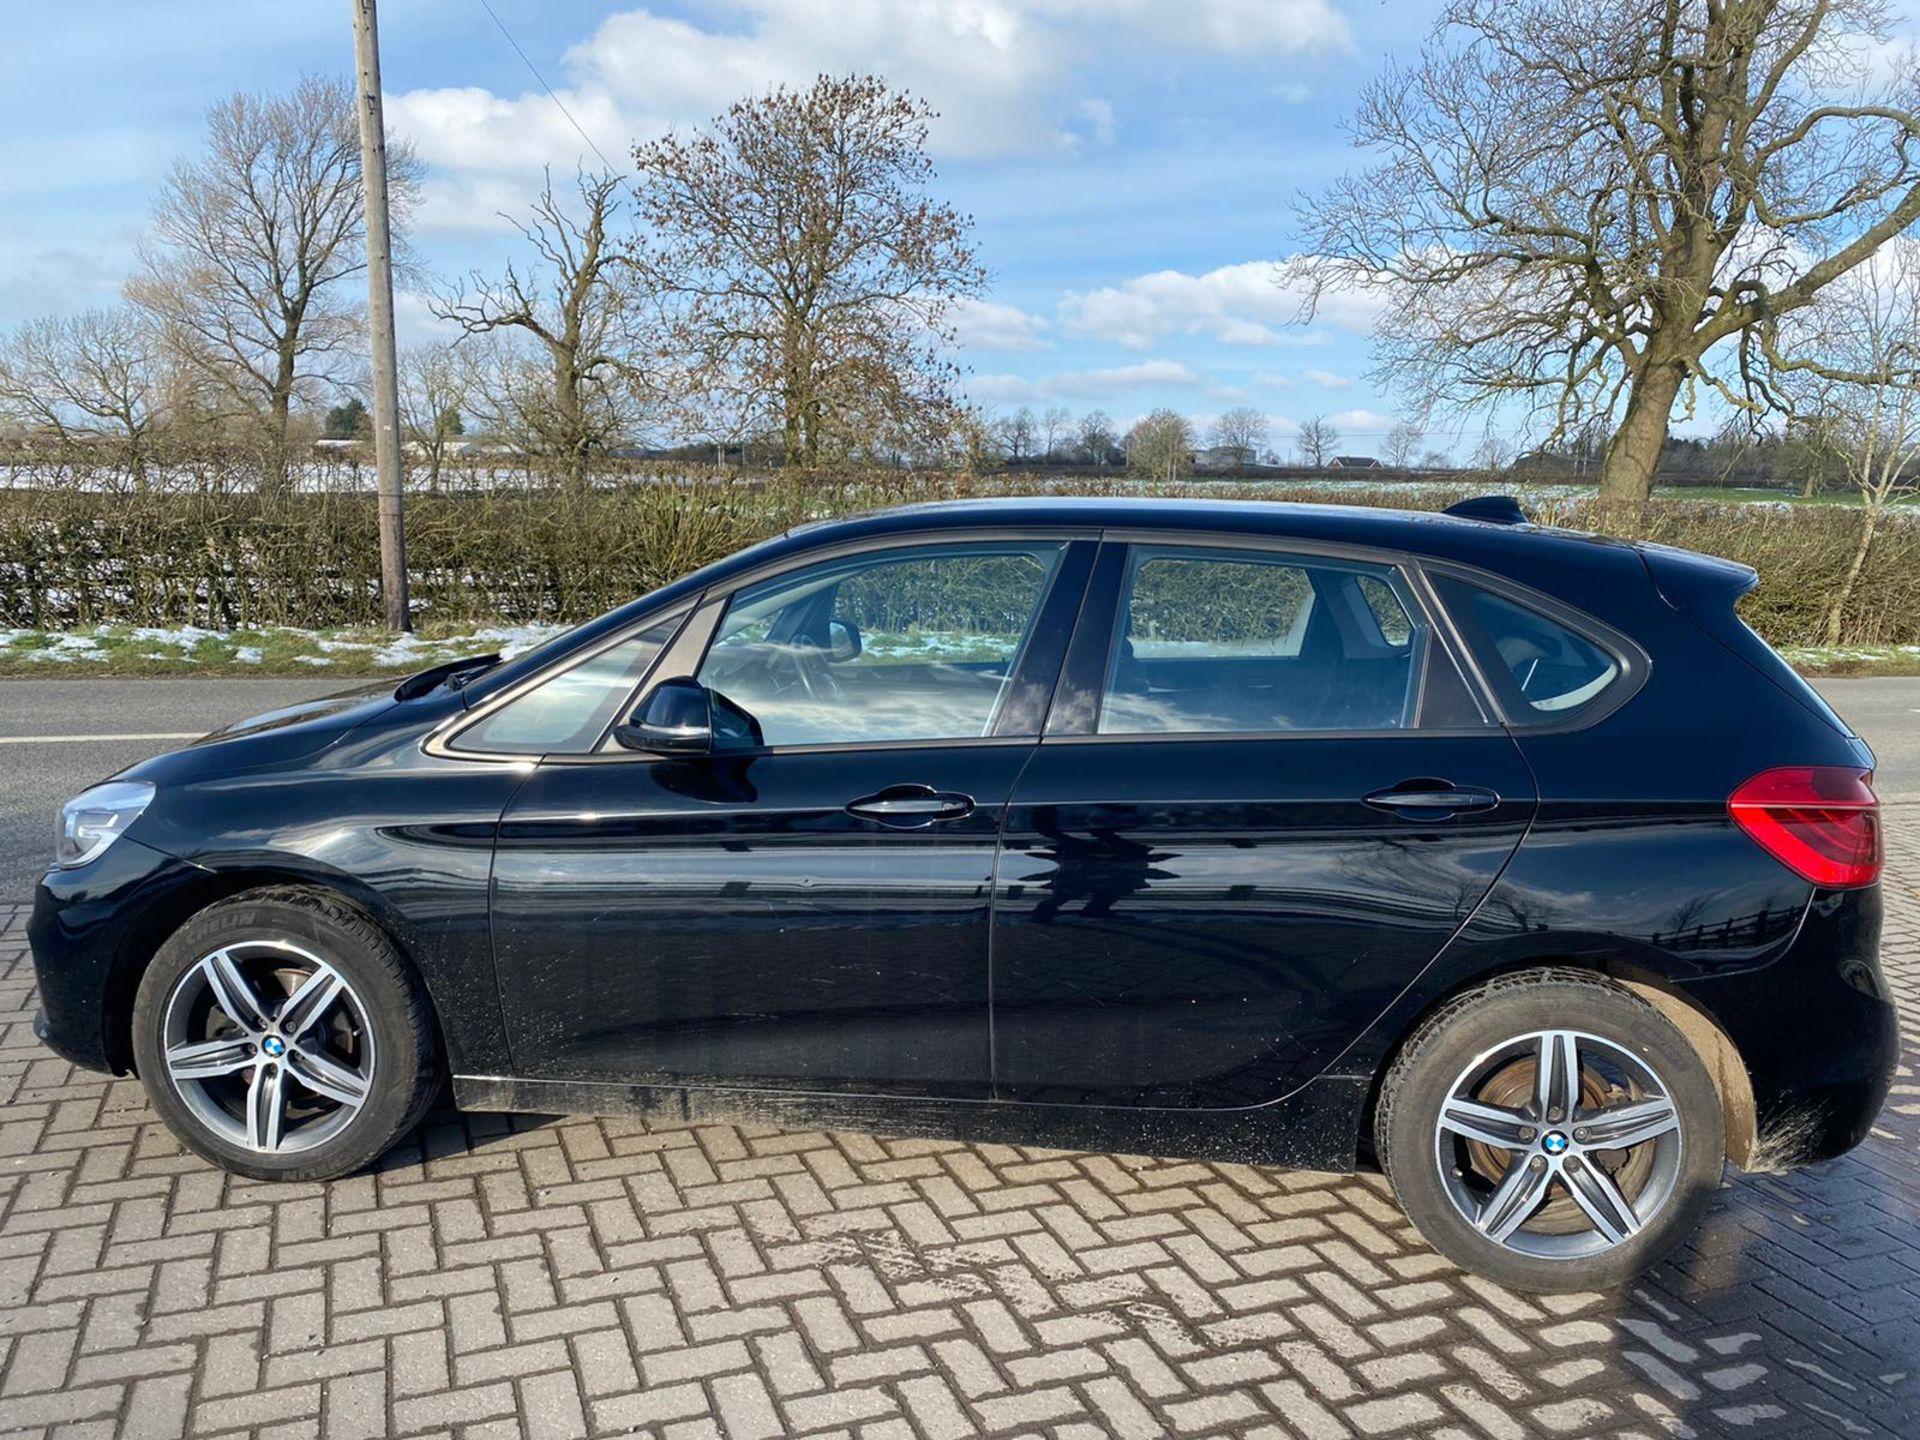 "ON SALE BMW 218d ""SPORT"" MPV 2.0 DIESEL ""EURO 6"" (2016 REG) - 1 OWNER - GREAT SPEC - BLACK - LOOK!! - Image 4 of 16"